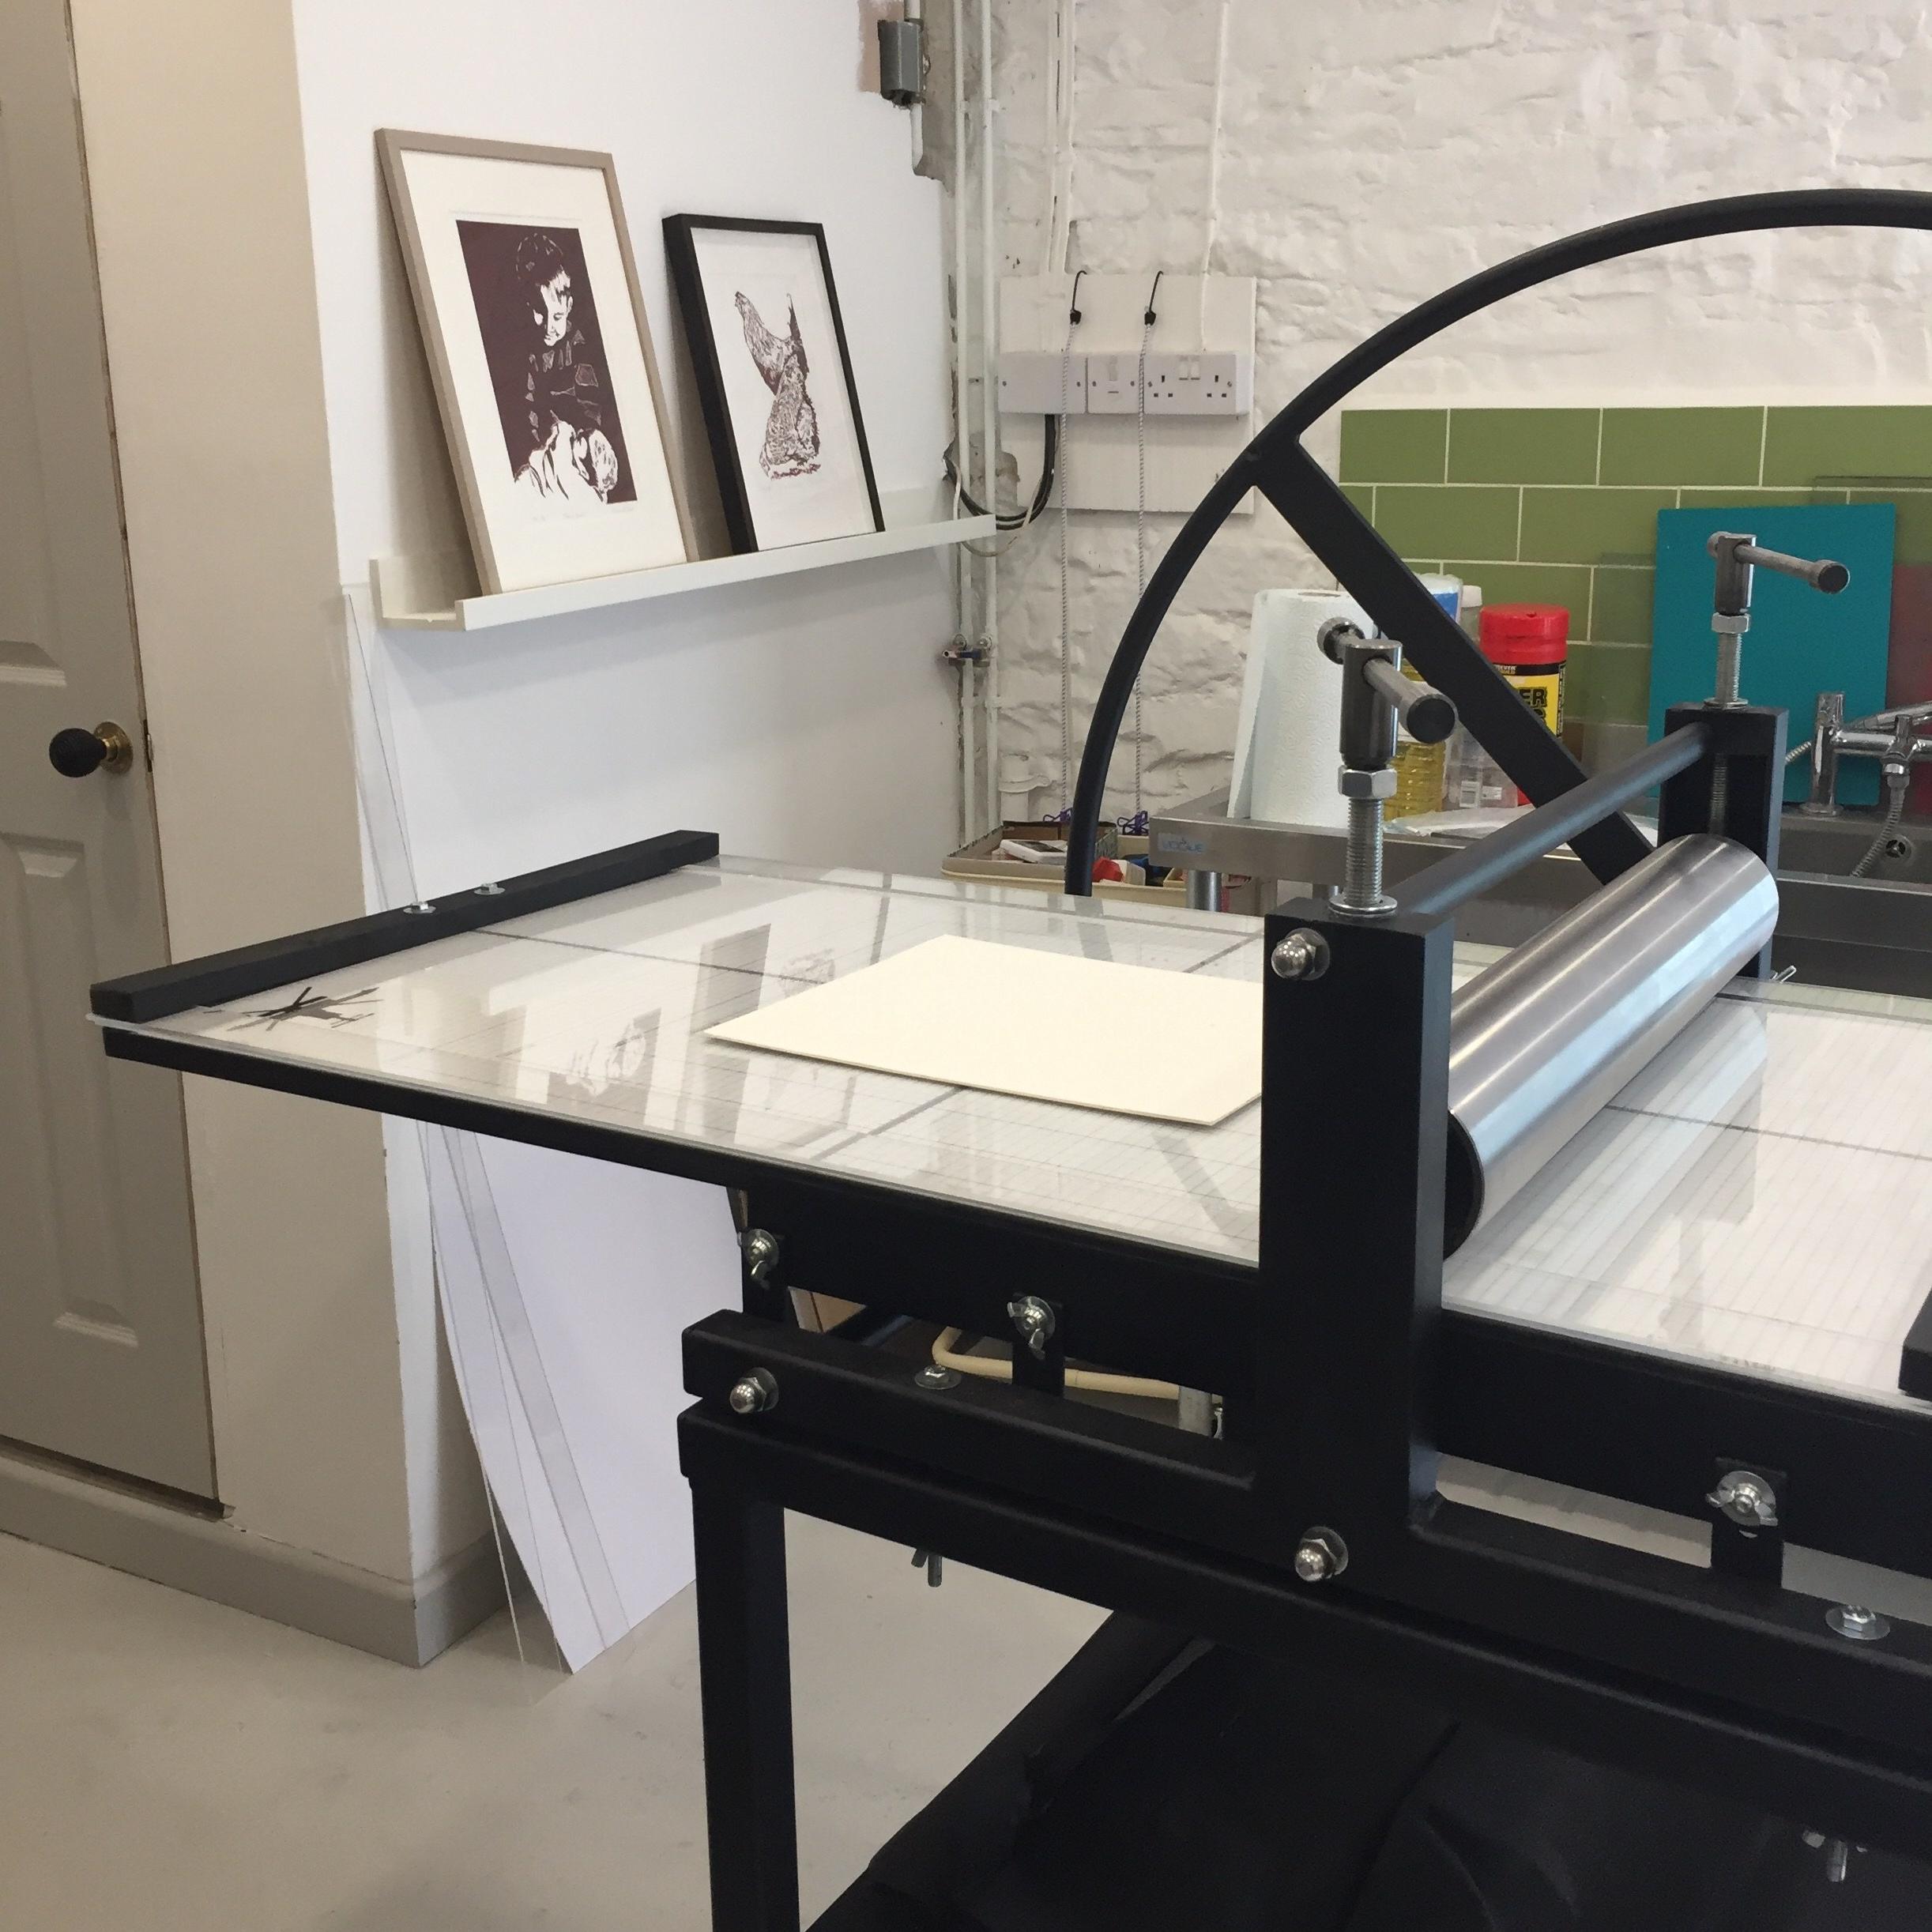 Skirrid Print Studio: 'Dolly'